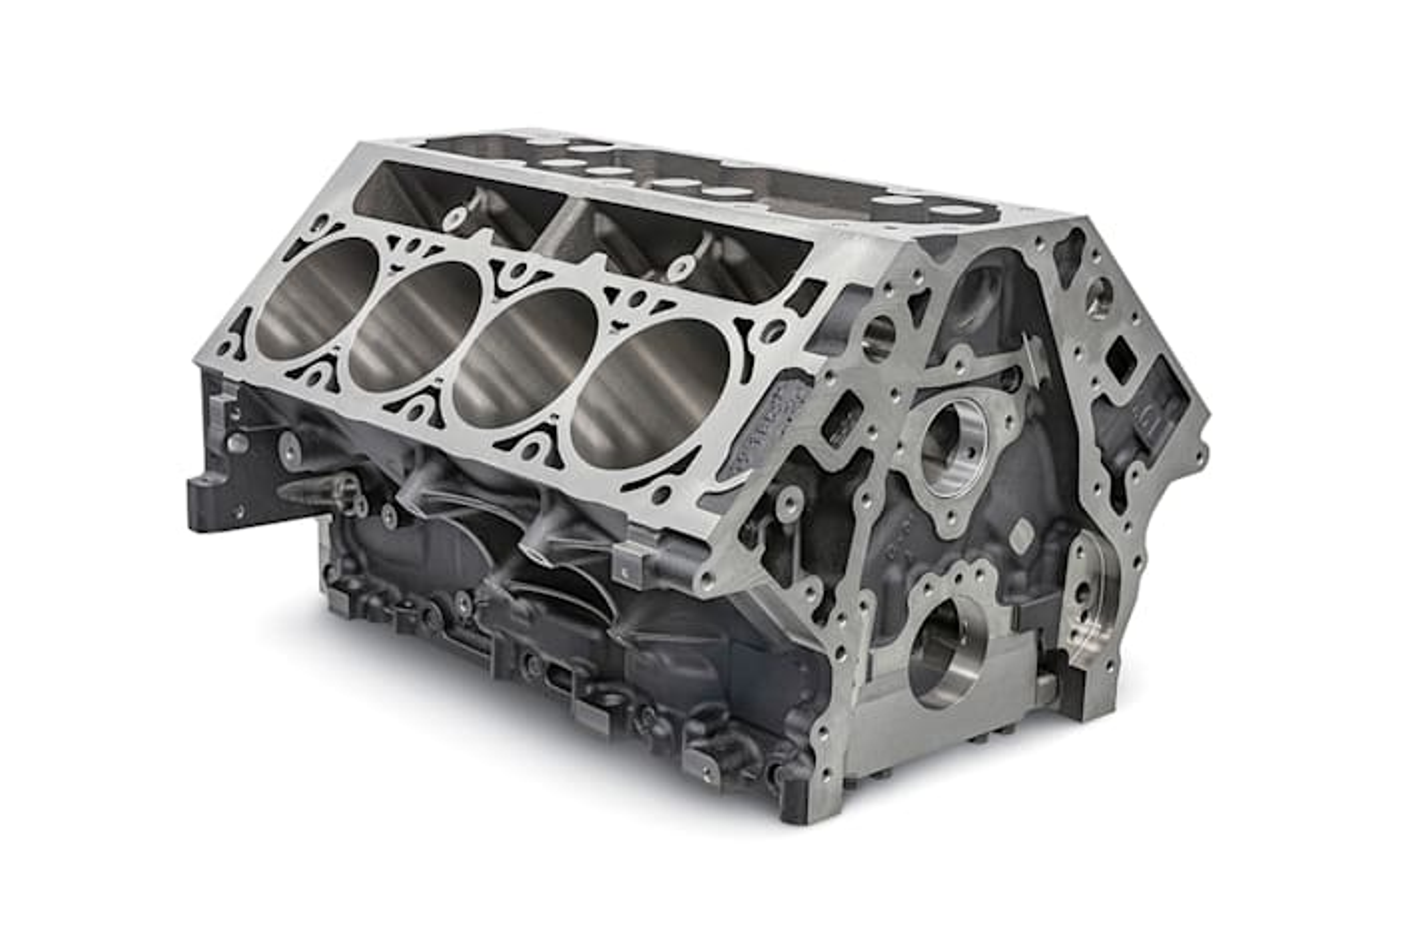 L 8 T Engine 1422 Jpg